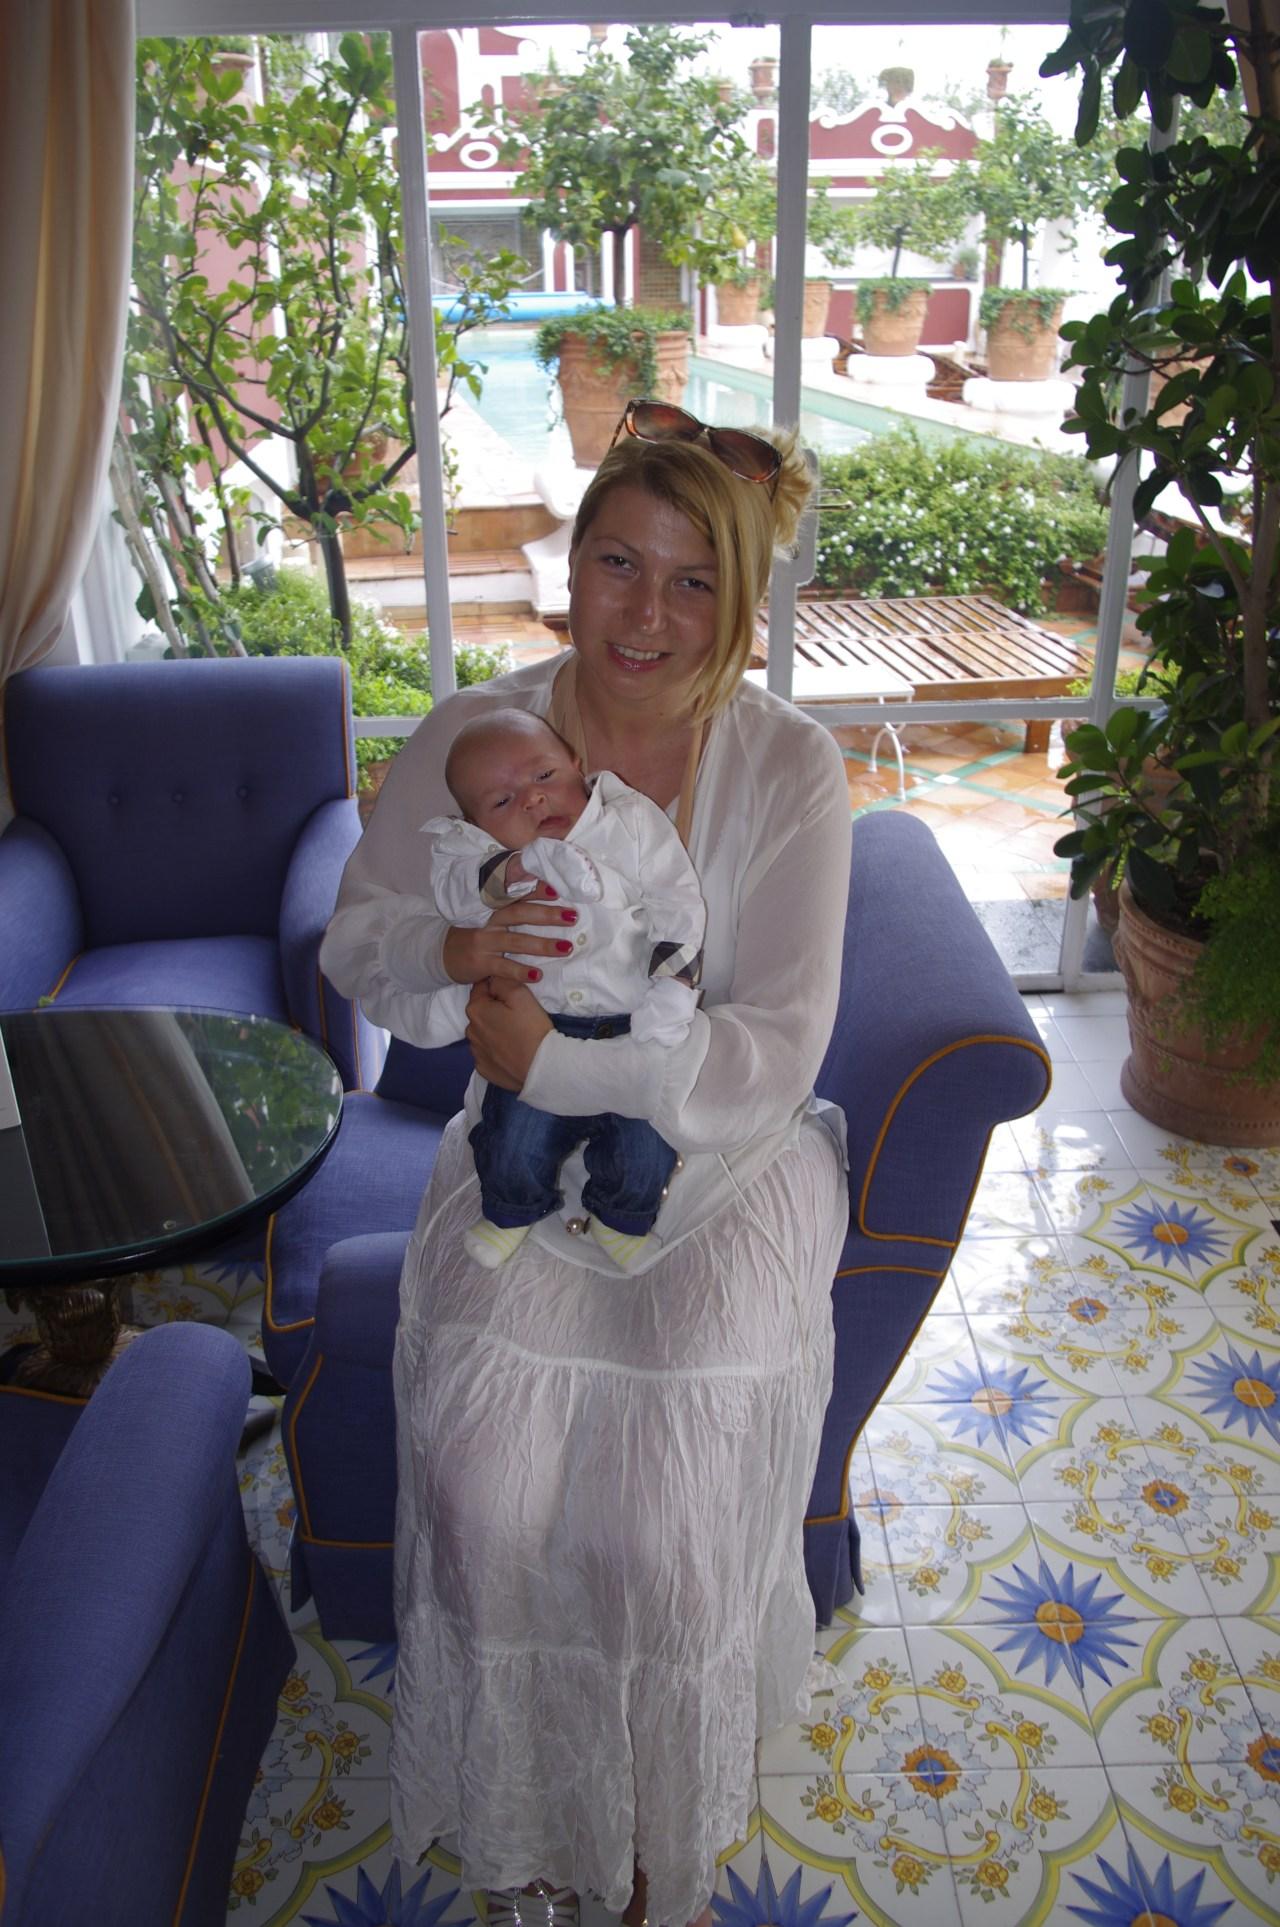 Amalfi with baby: Hotel Sireneuse, Positano